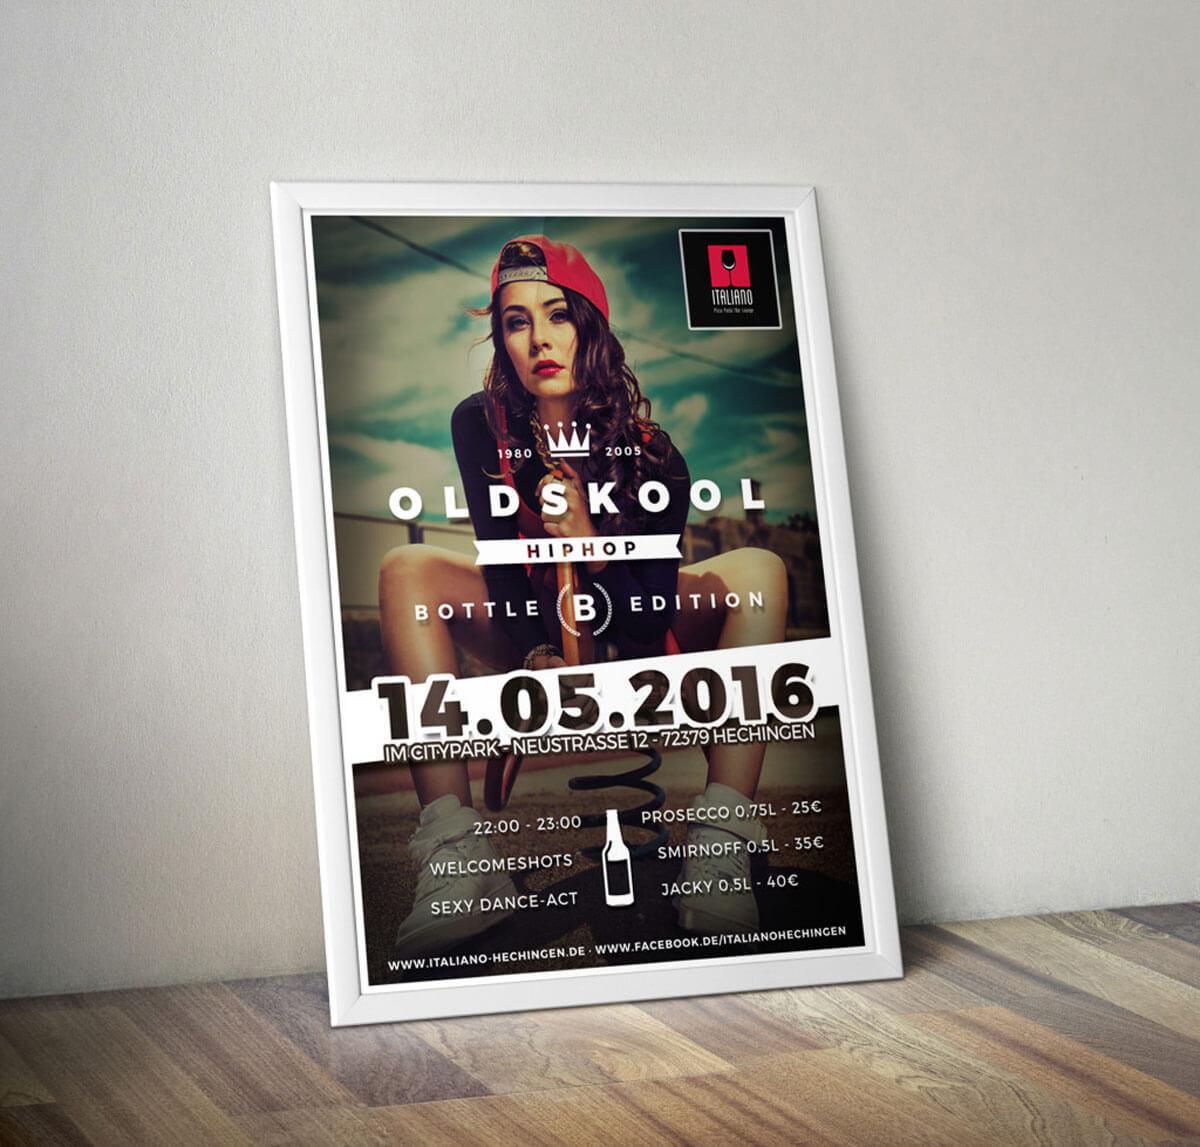 Oldskool HipHop im Italiano - Portfolio Herr Knobel